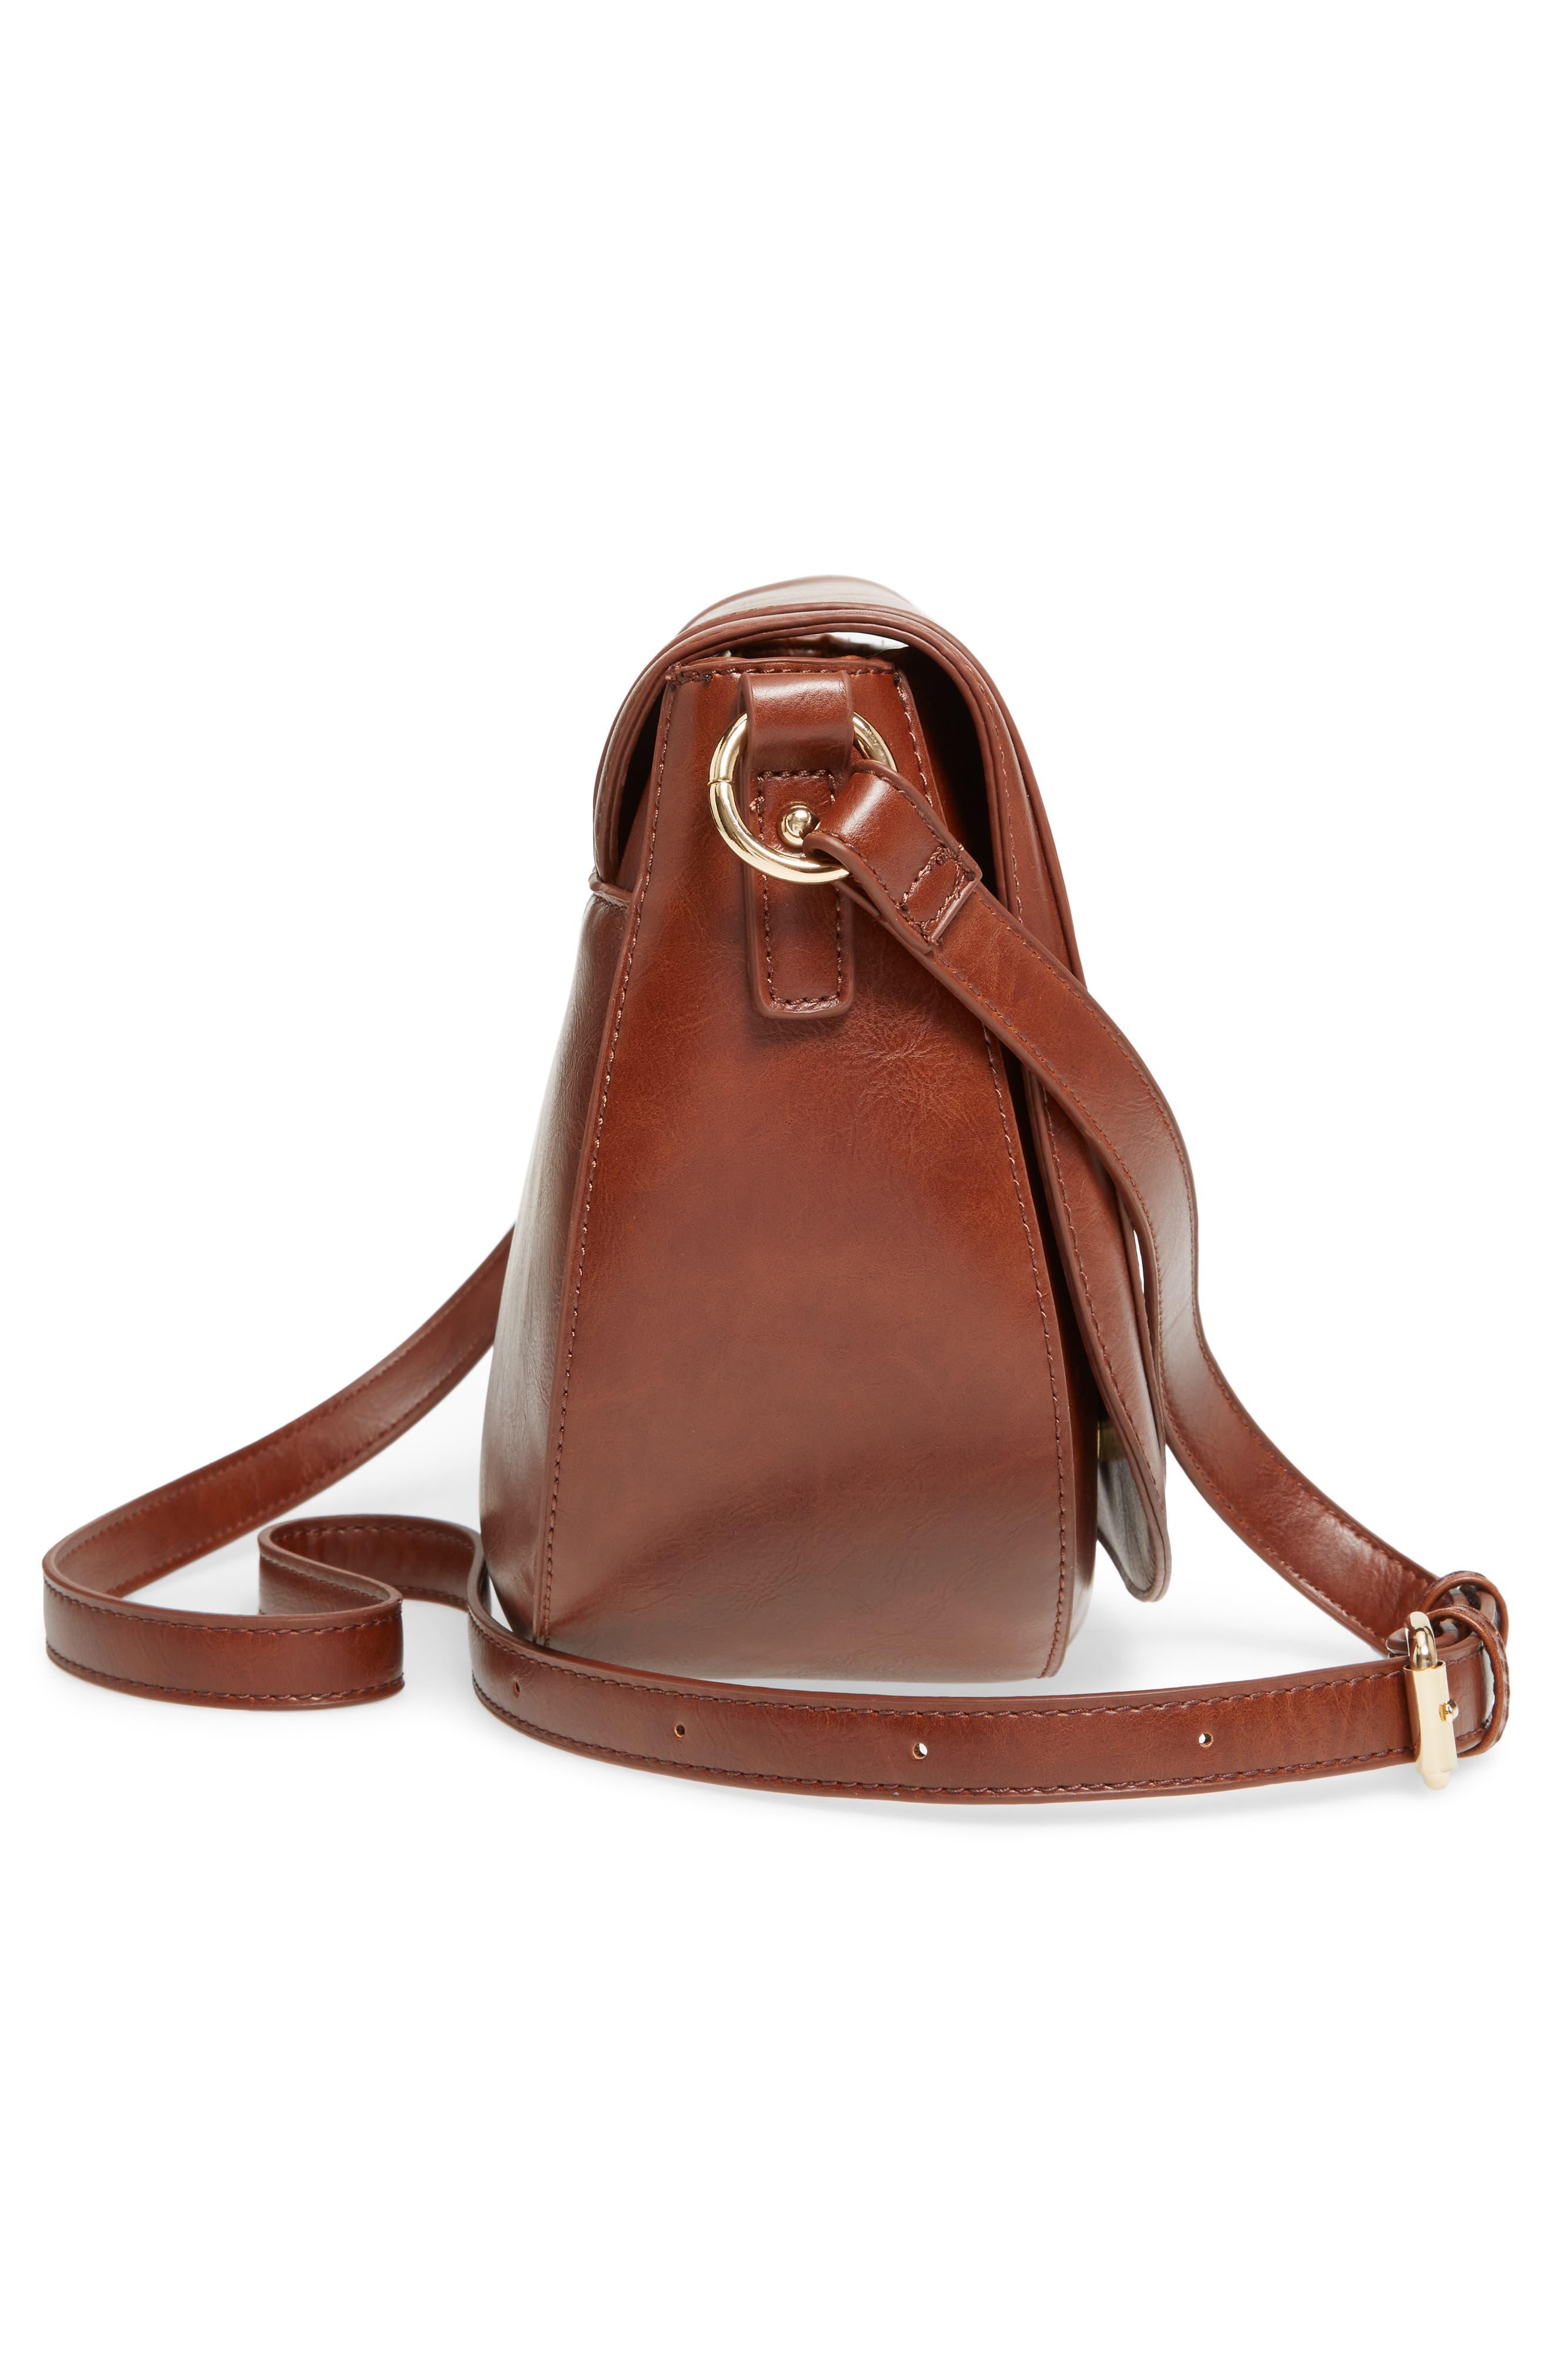 Piri Faux Leather Saddle Bag,                             Alternate thumbnail 15, color,